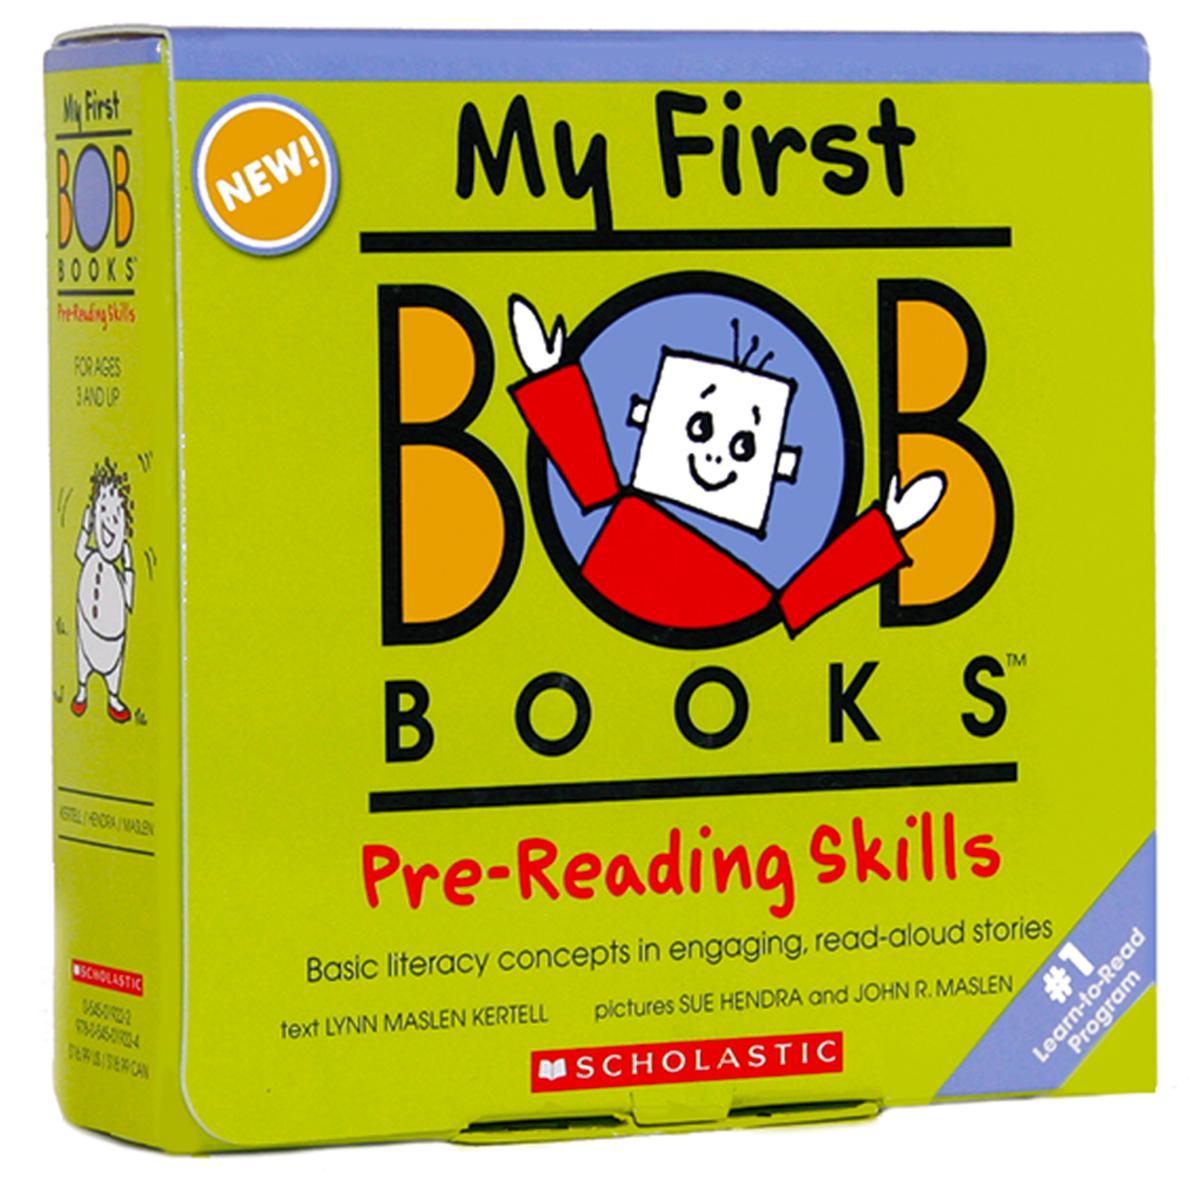 My First BOB Books®: Pre-Reading Skills Boxed Set